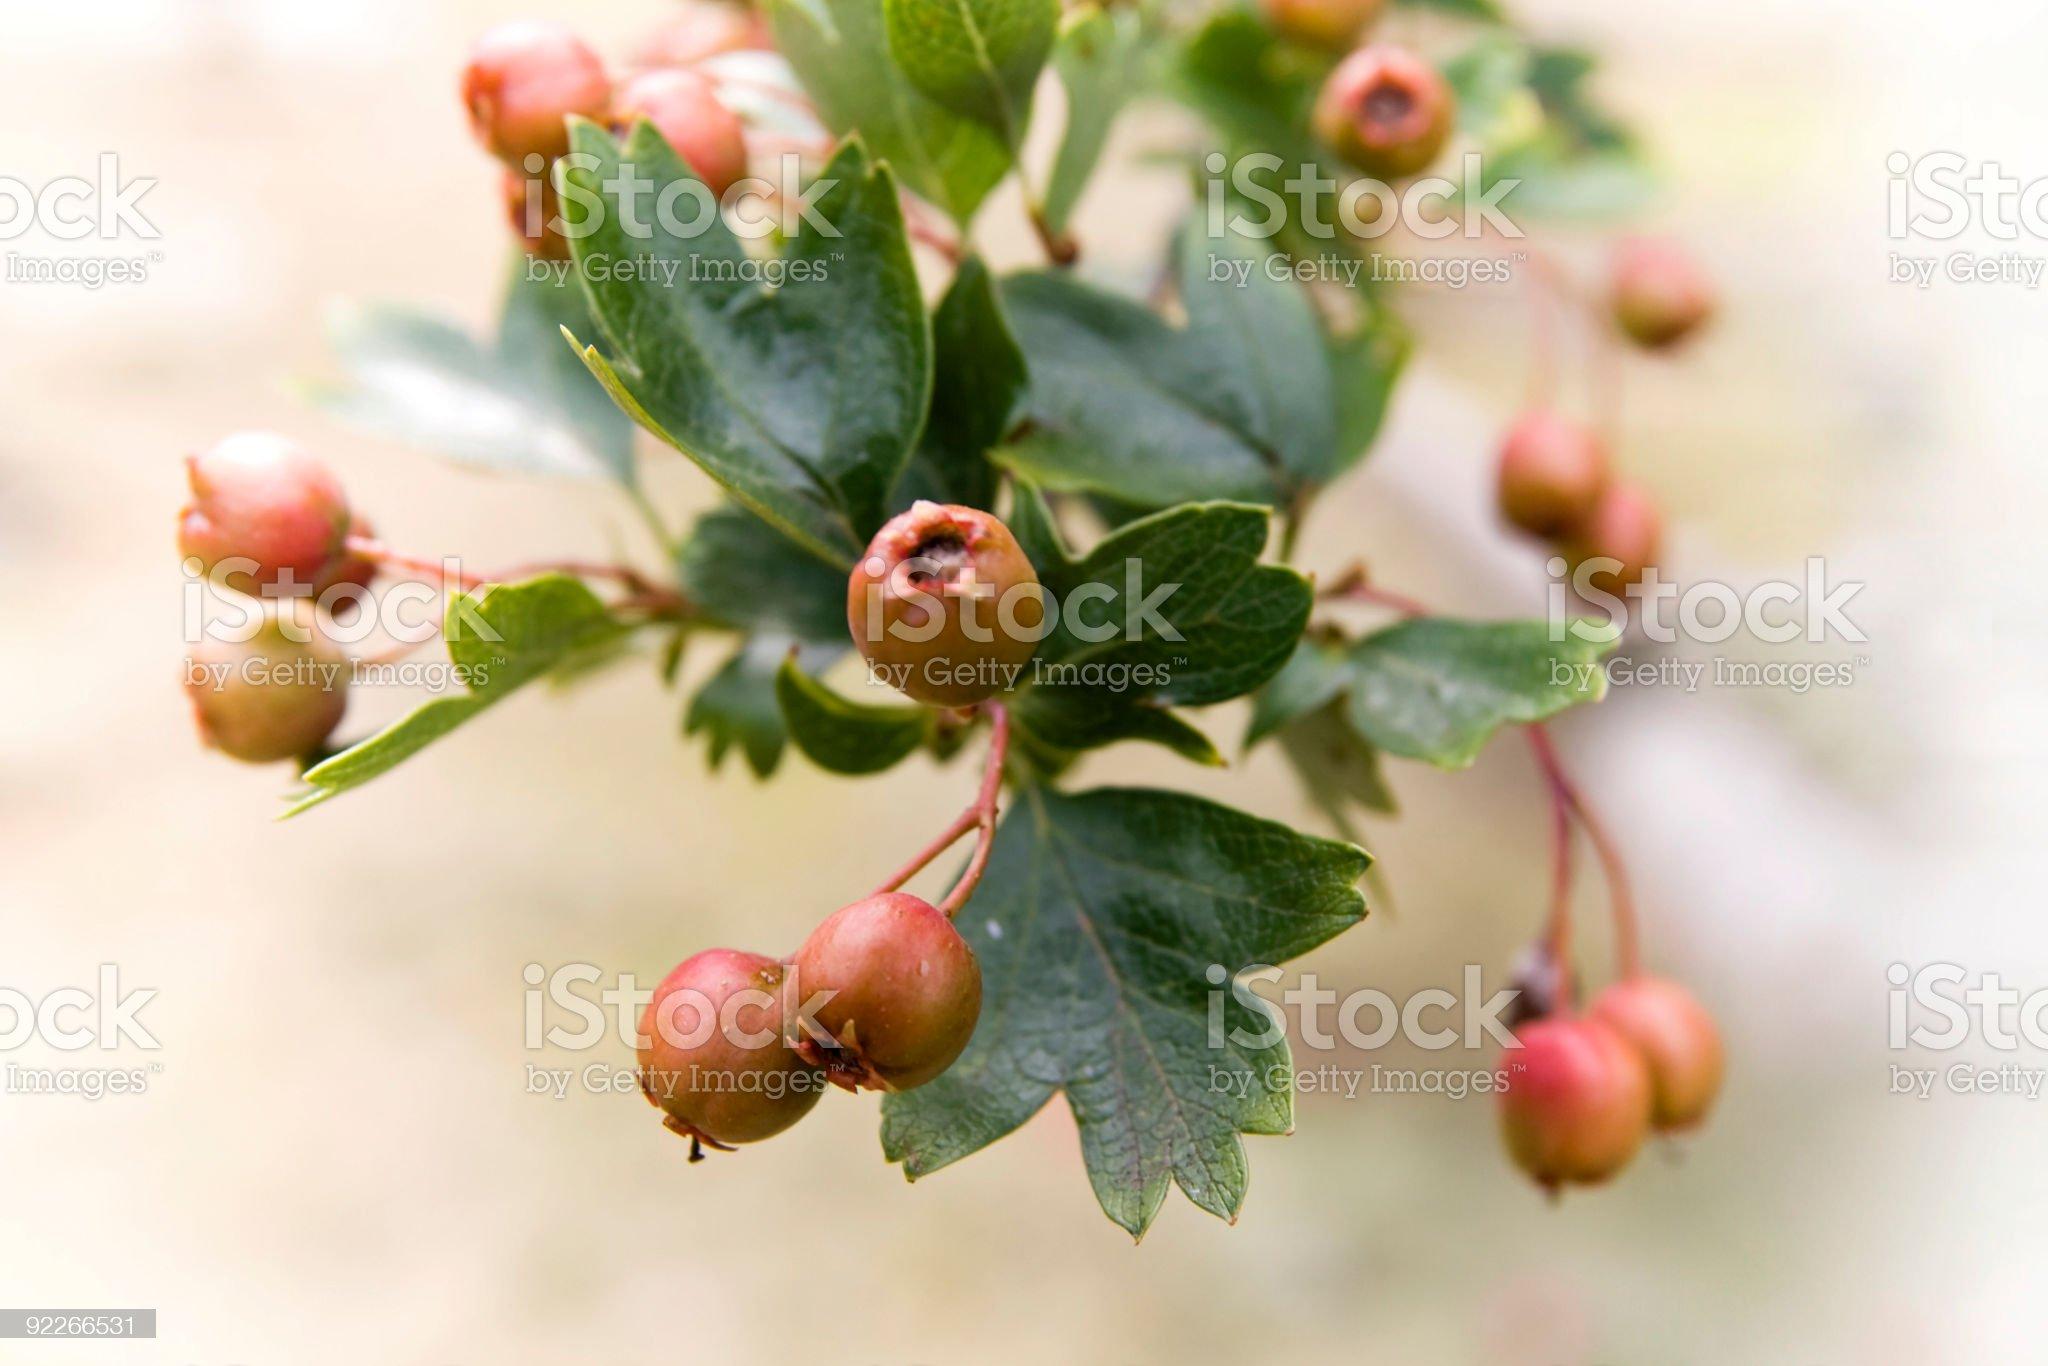 Berries royalty-free stock photo